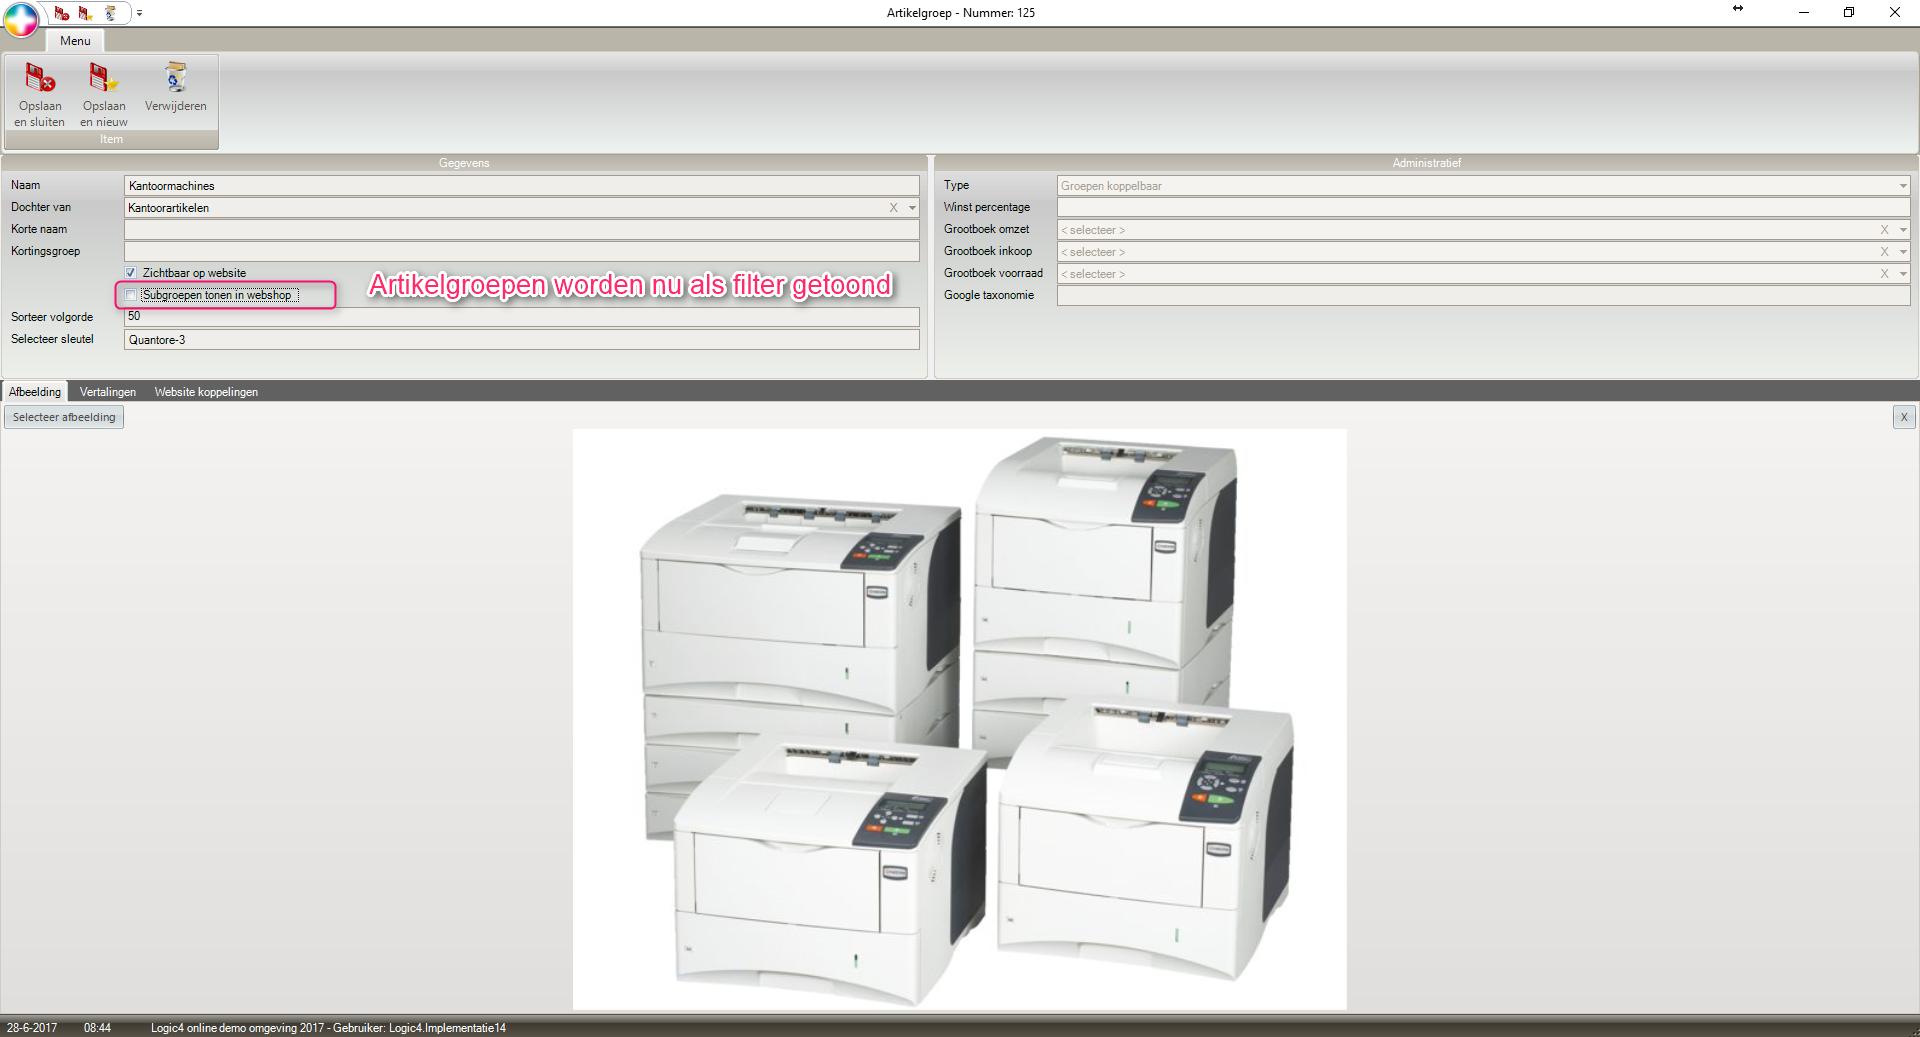 webshop-filtercategorie